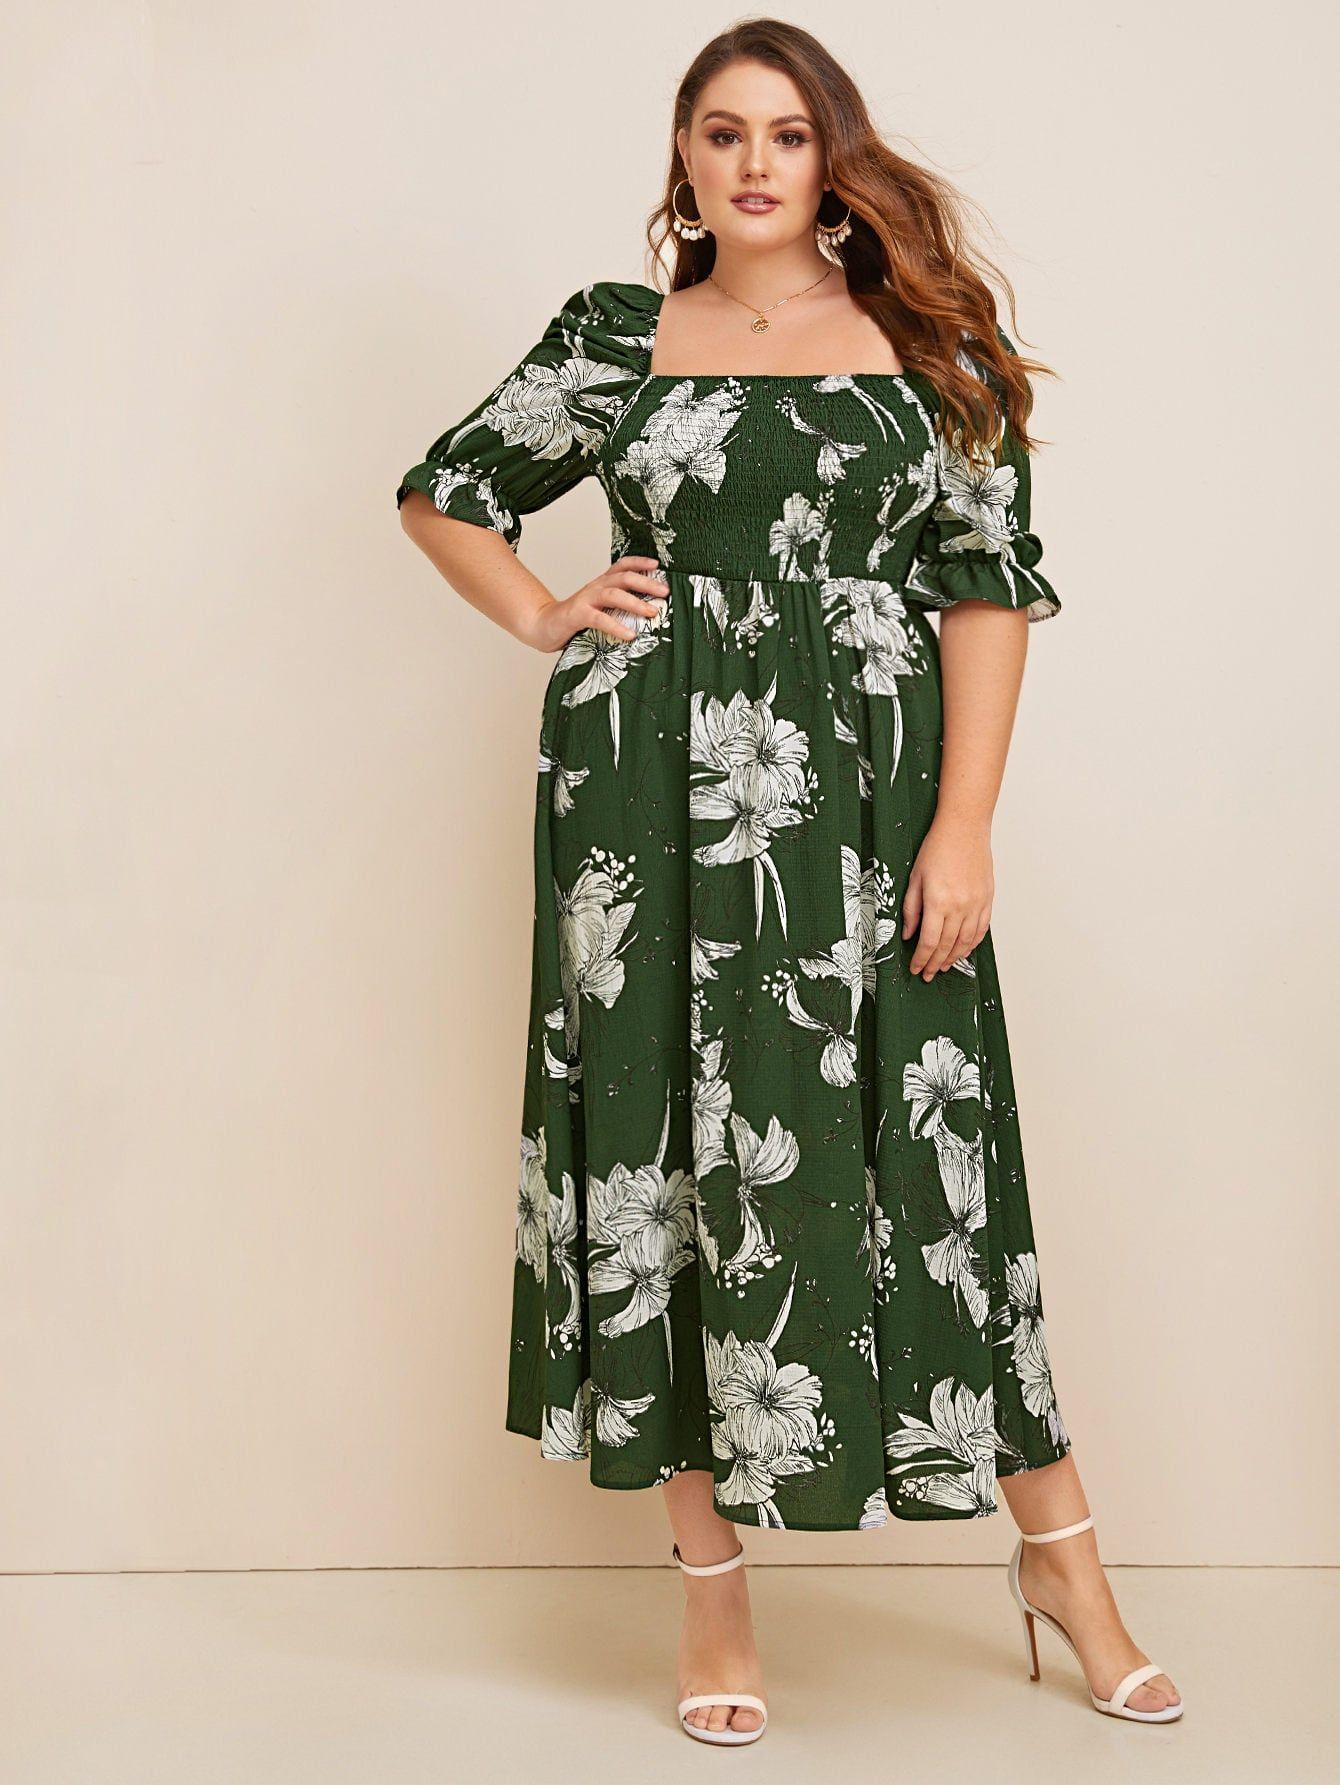 Plus Puff Sleeve Shirred Botanical Print Smock Dress Sponsored Affiliate Shirred Sleeve Puff Plus Size Dresses Smock Dress Square Neck Dress